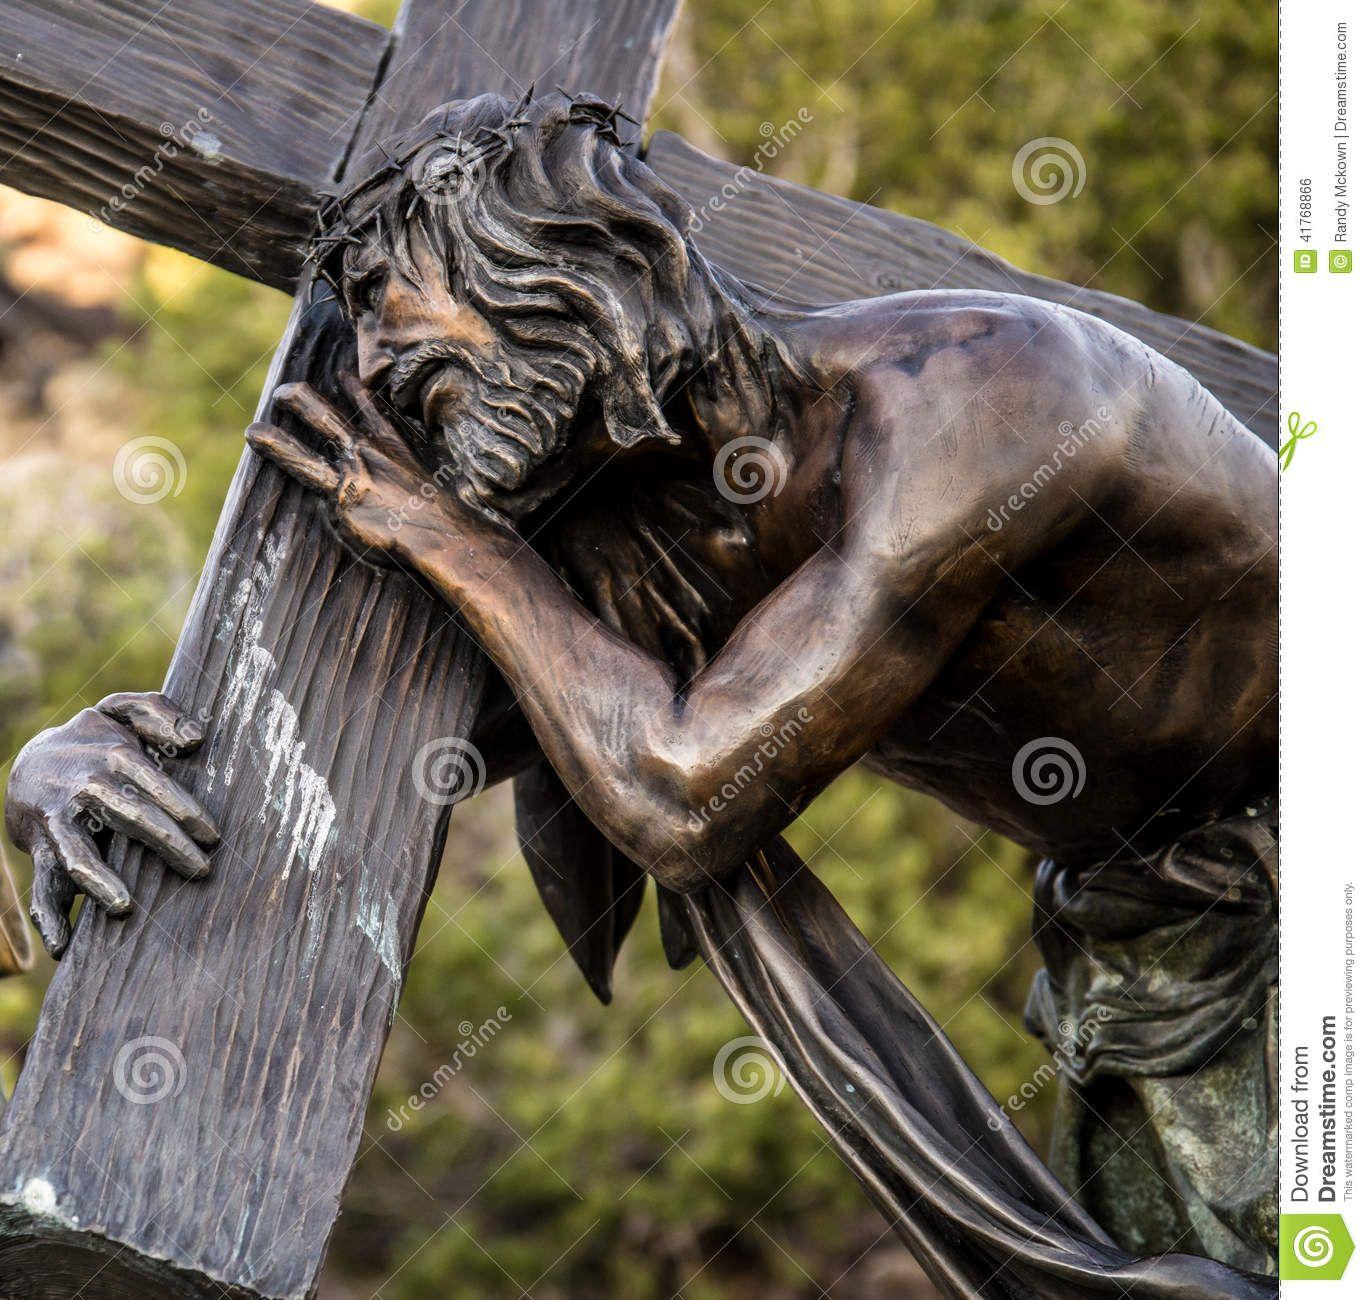 jesus carrying cross tattoo designs - Google Search   Angel tattoos ...